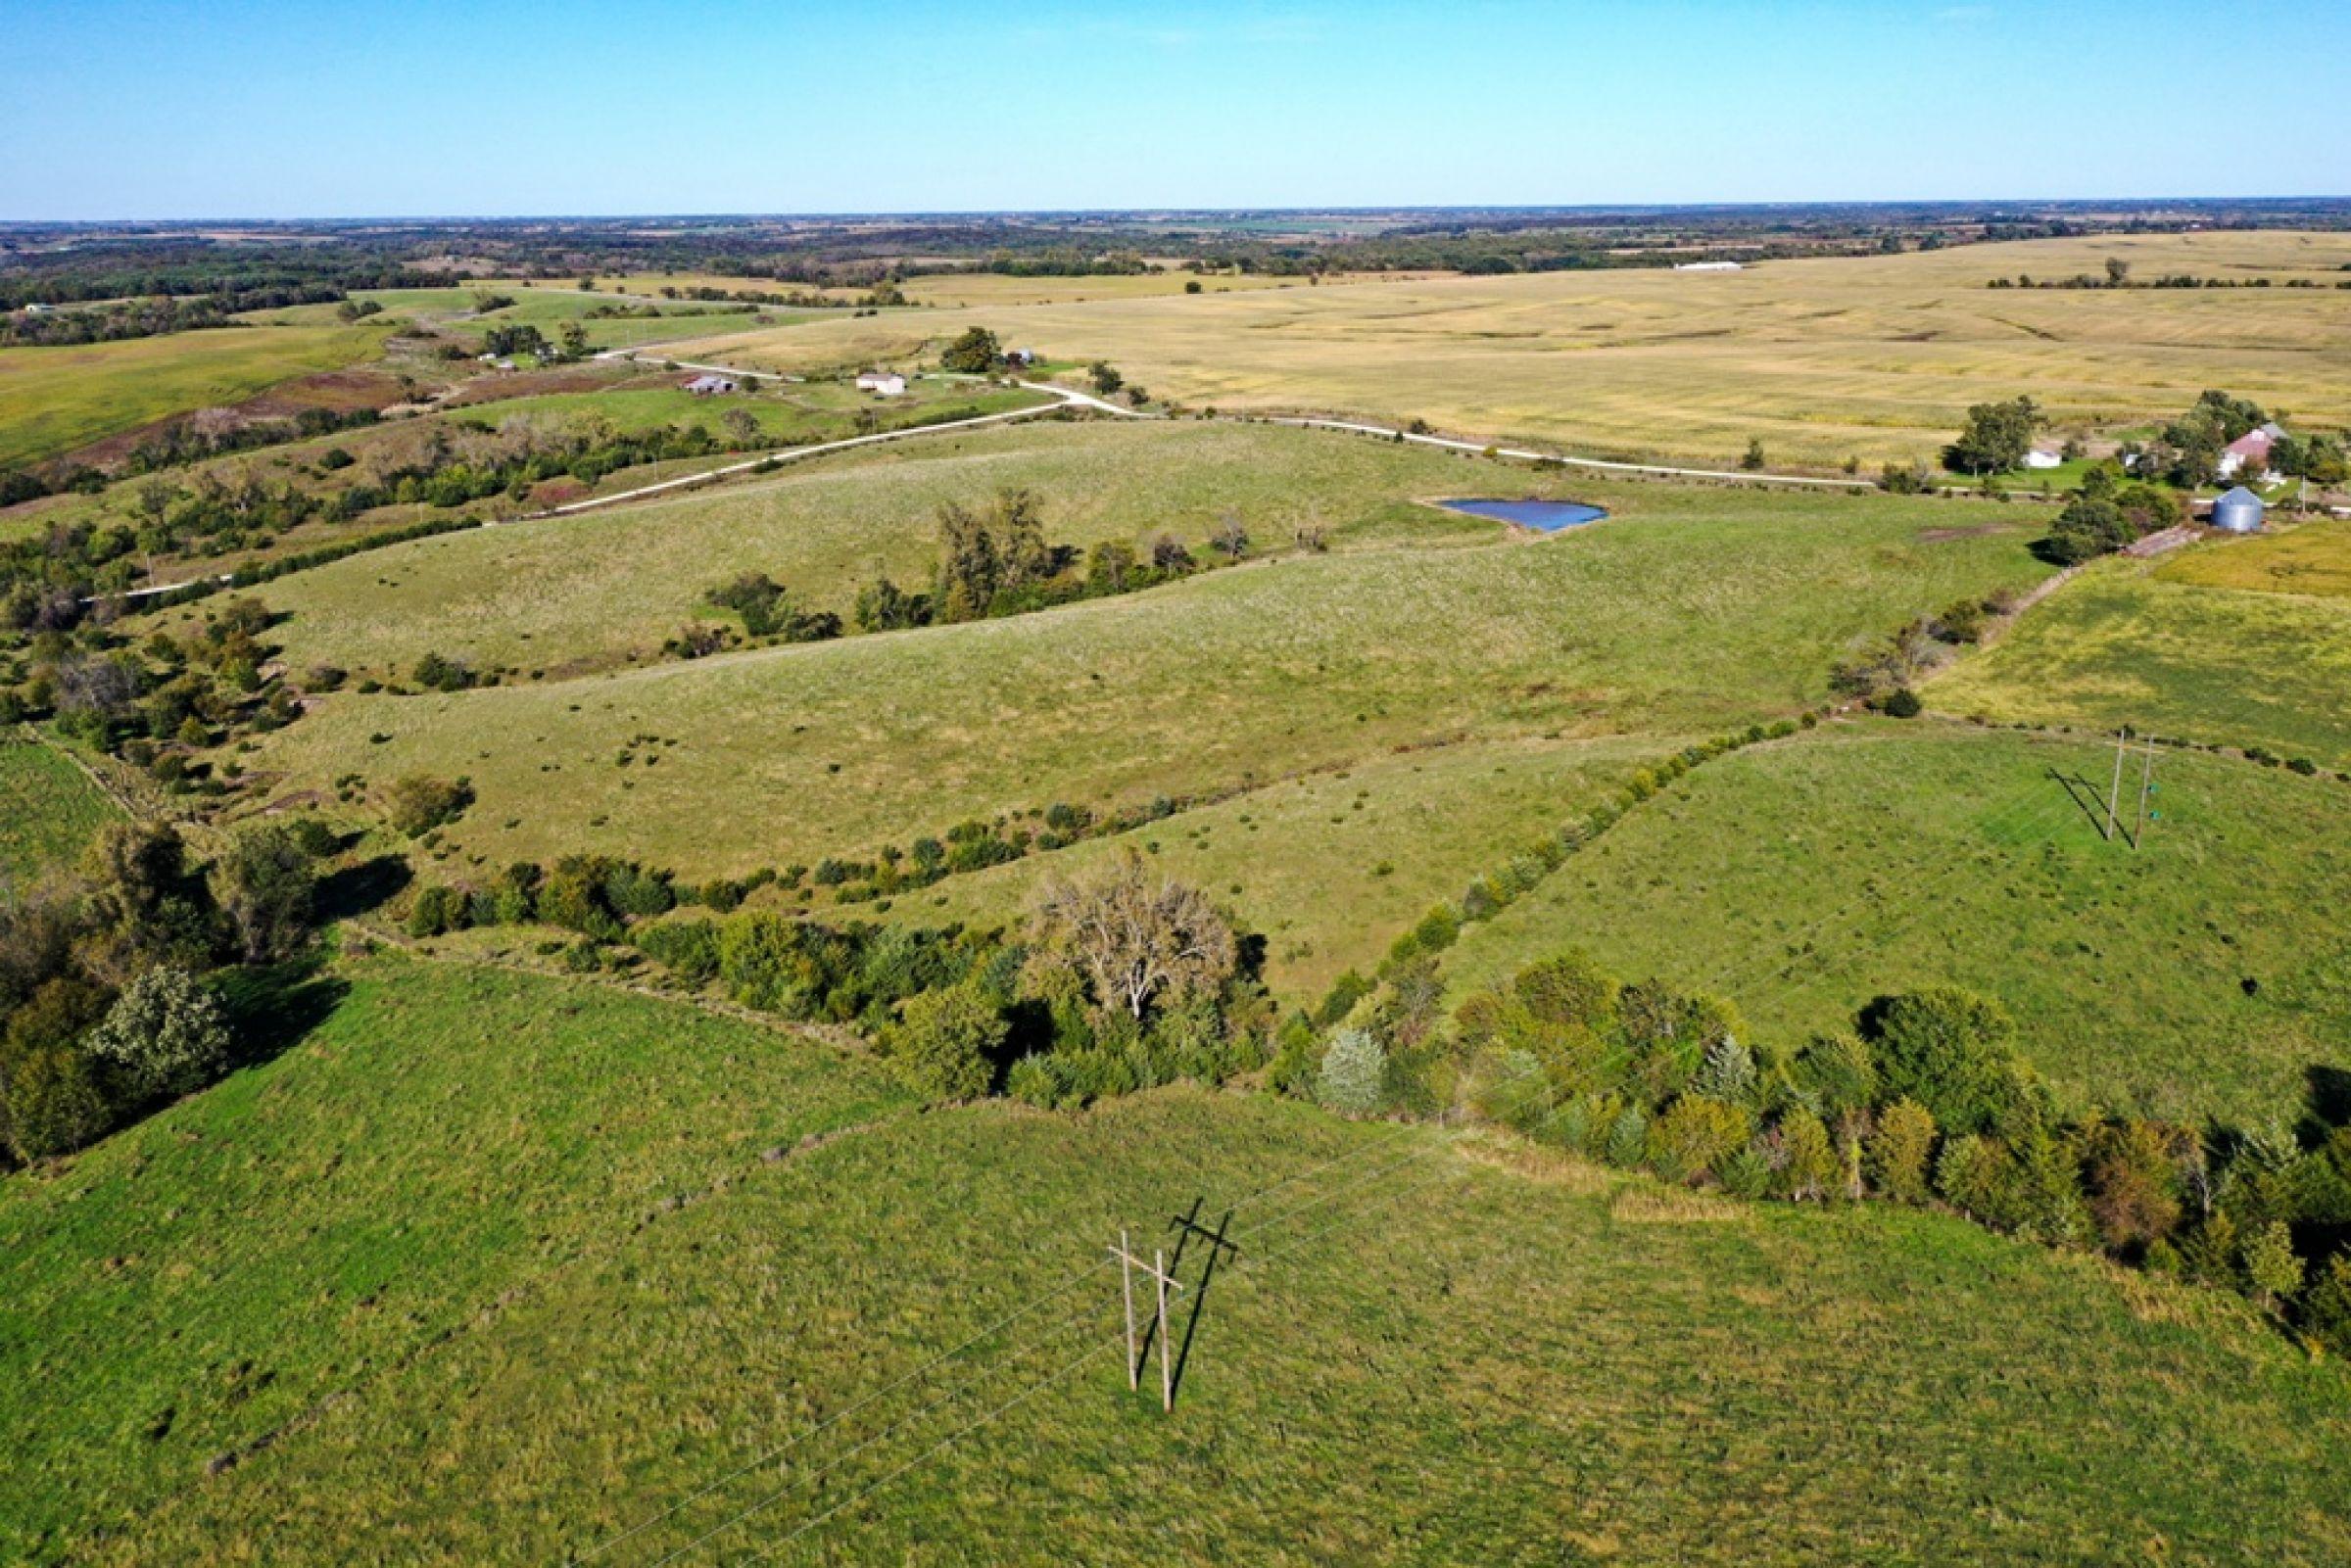 Peoples Company Land for Sale-Clarke County-000 170th Ave. Osceola, IA 50213